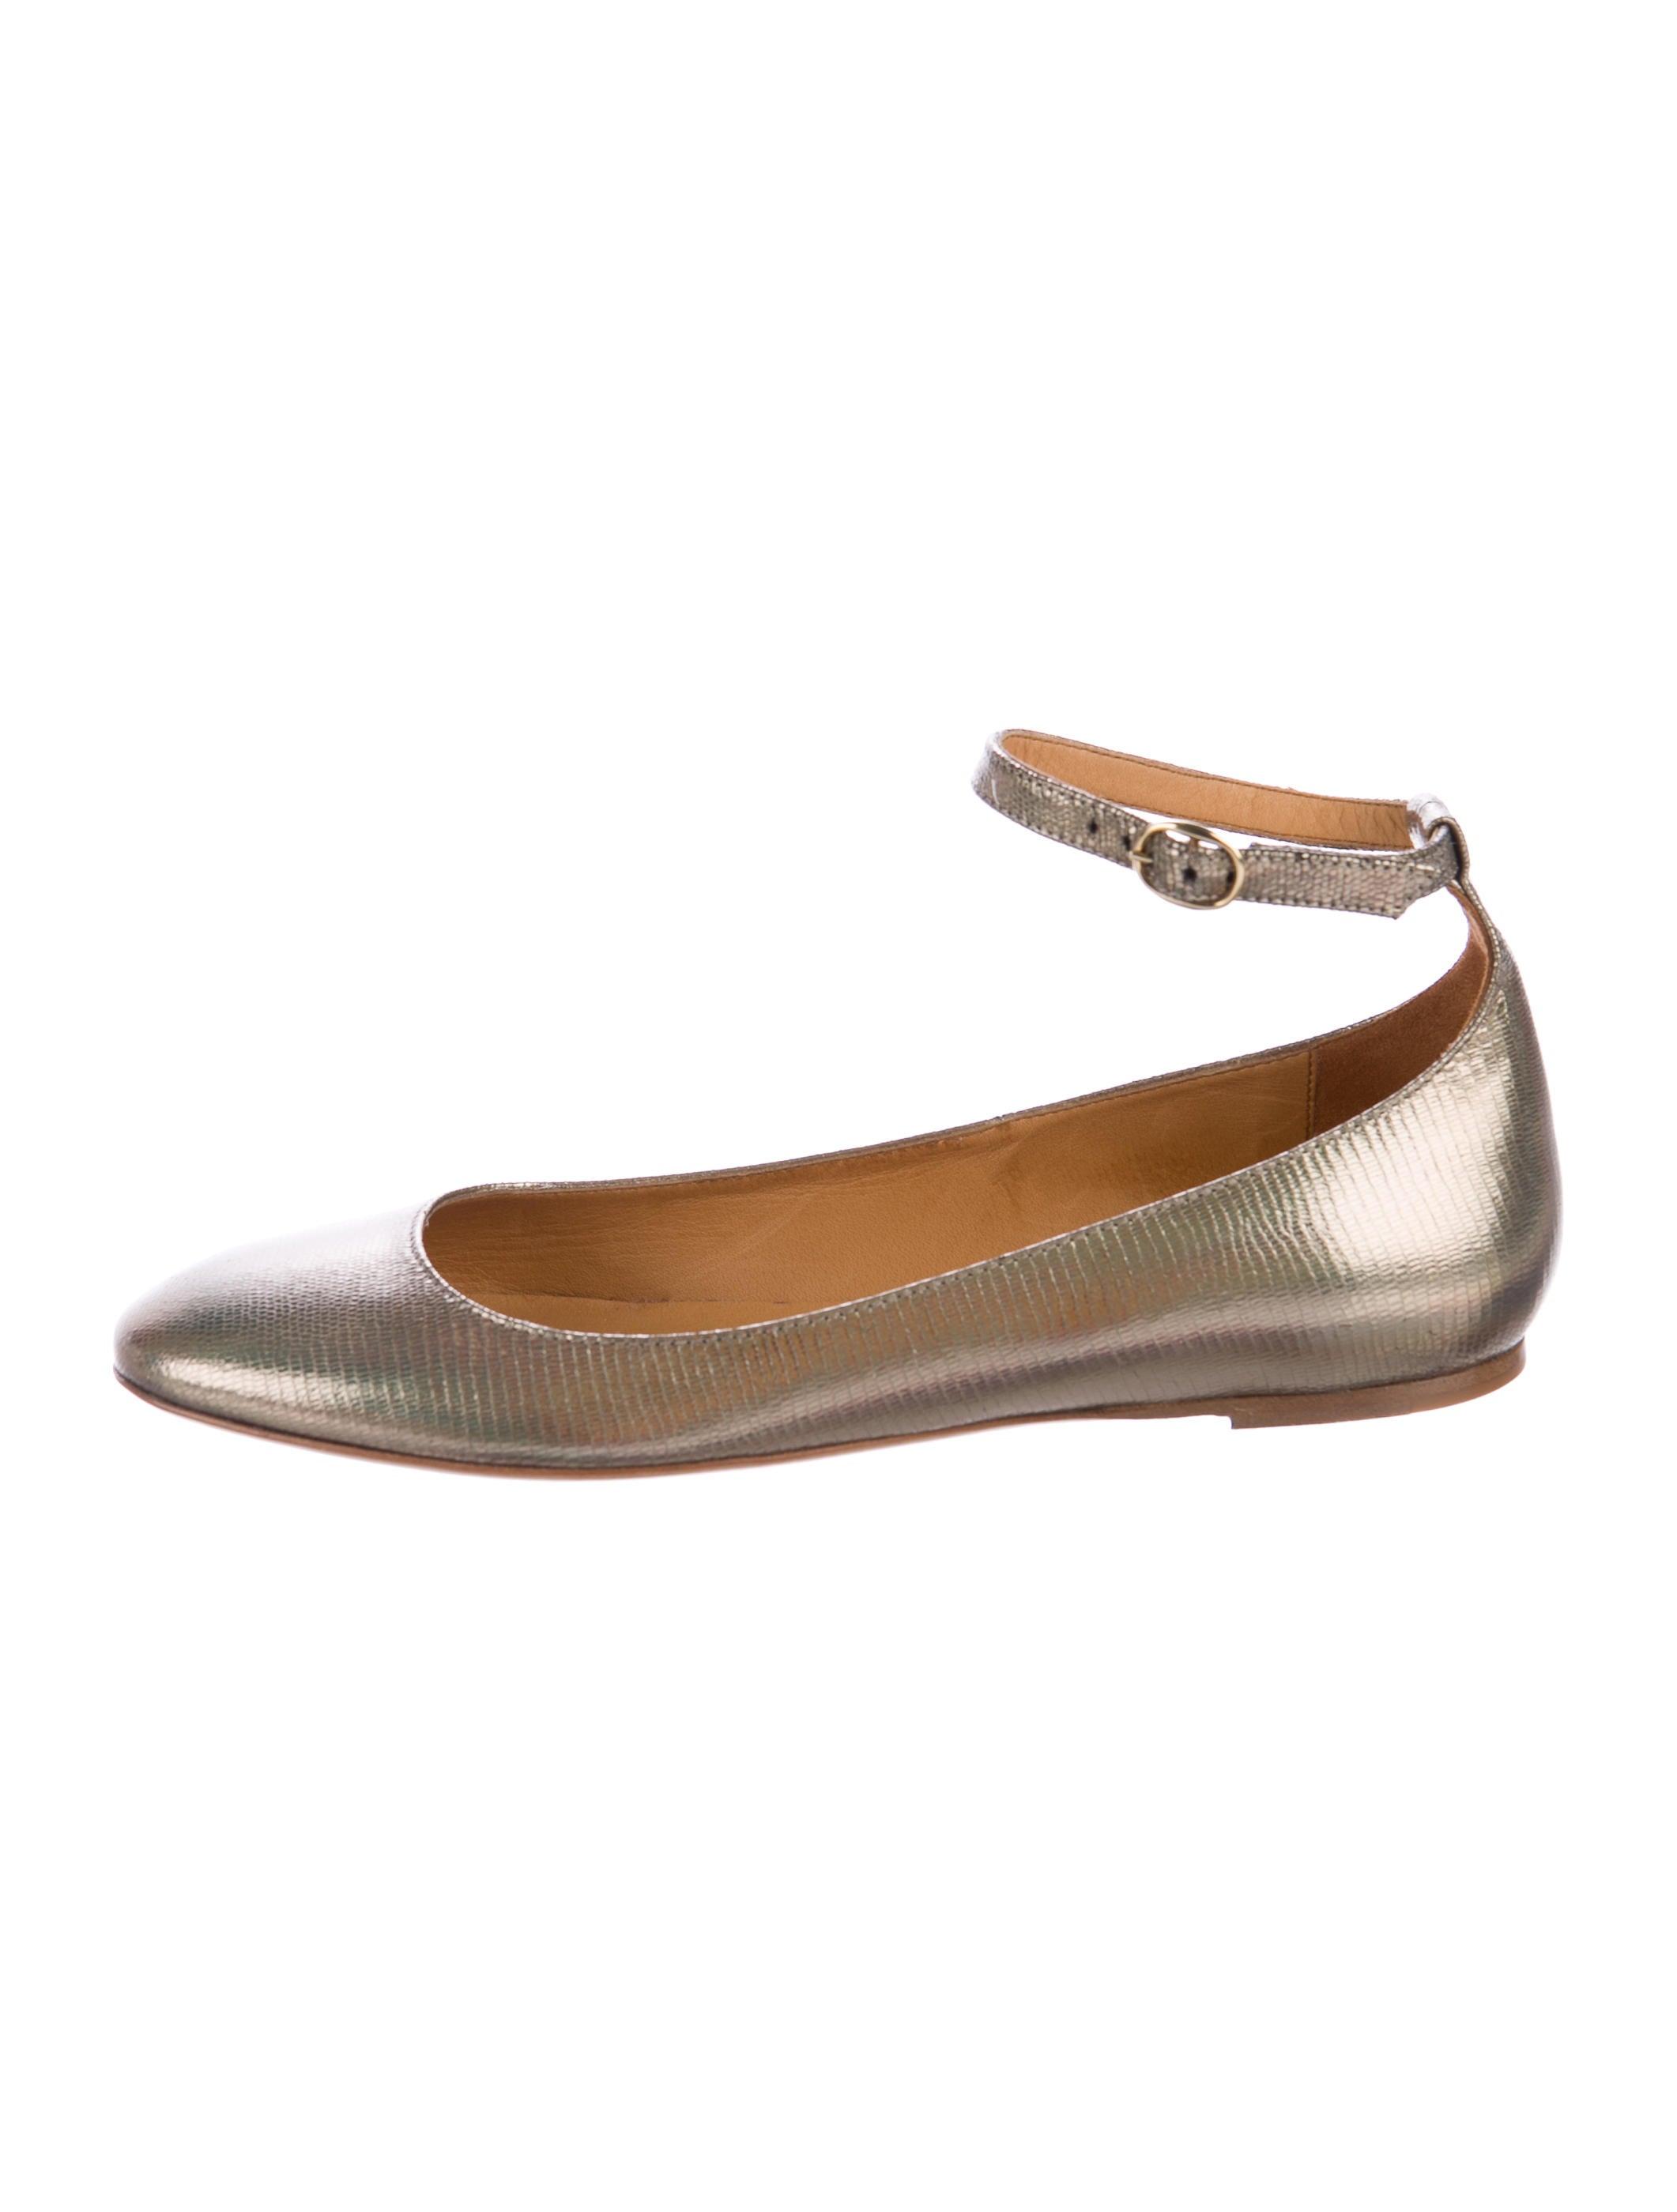 Isabel Marant Embossed Leather Flats best sale online TPt6Dx7VXZ